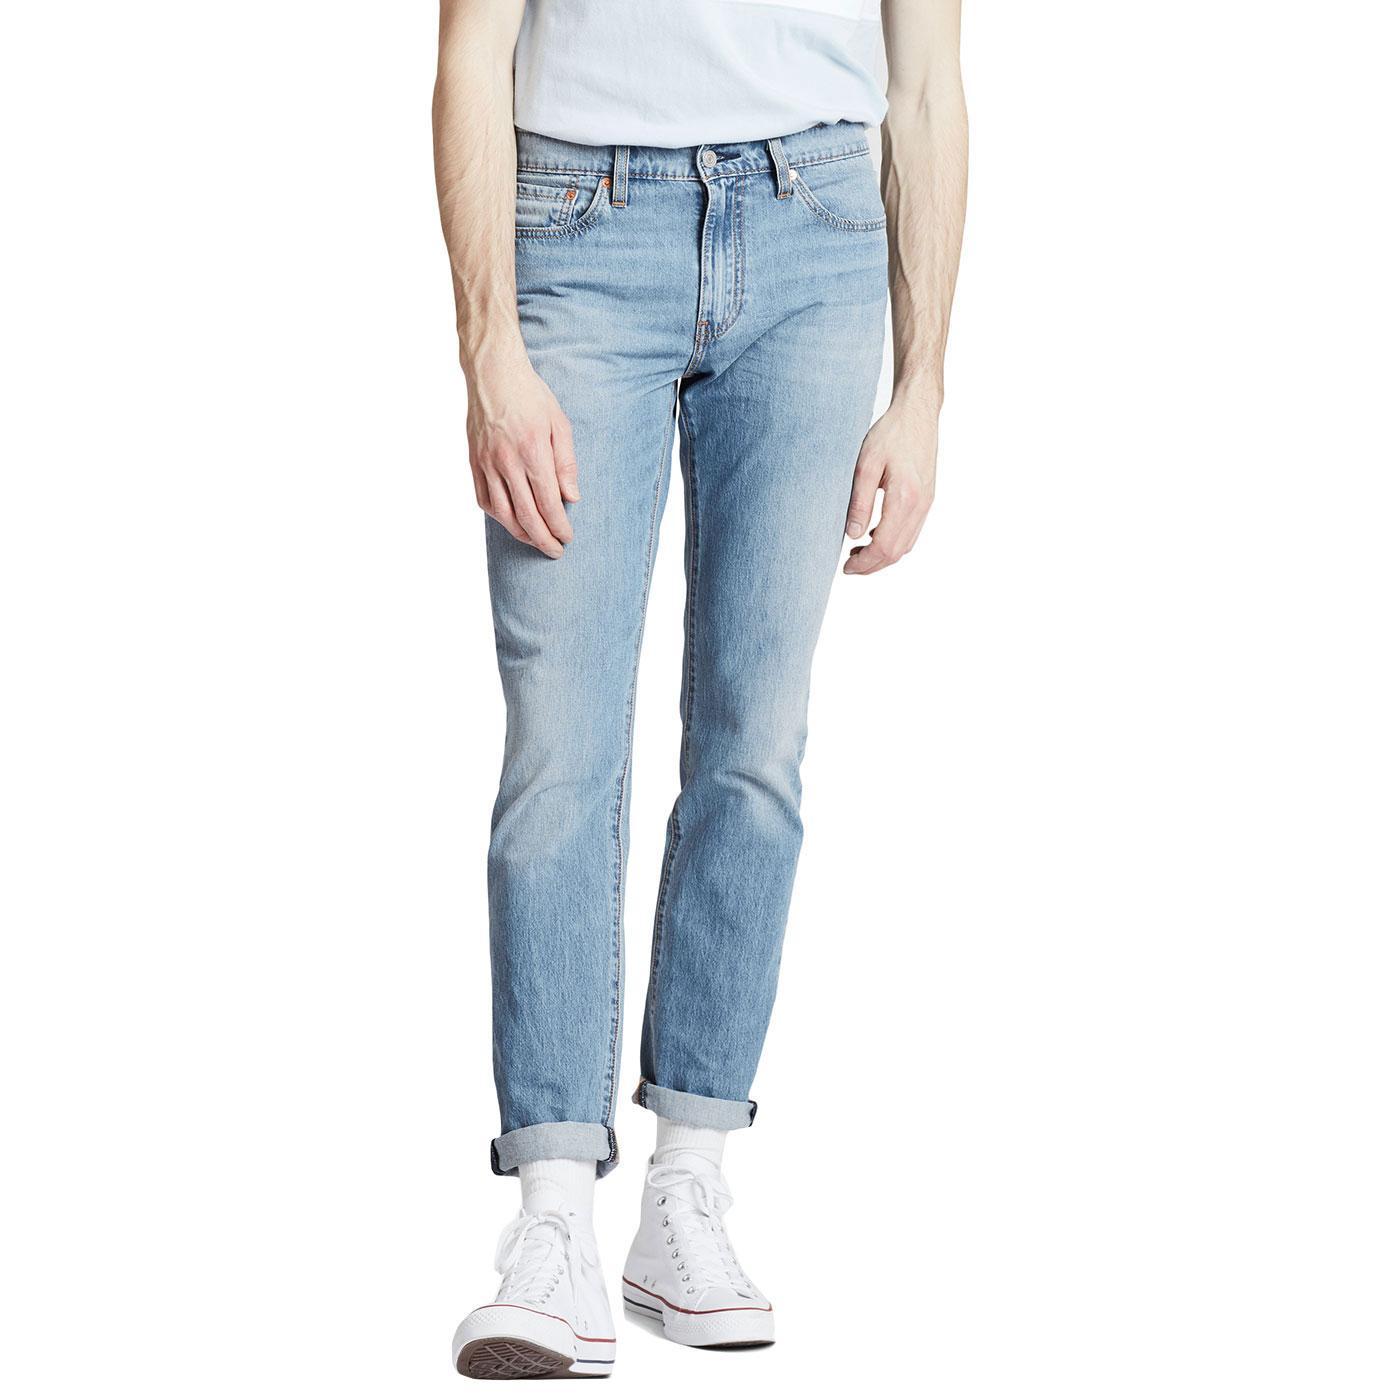 LEVI'S 511 Retro Mod Slim Jeans (Nurse Warp Cool)